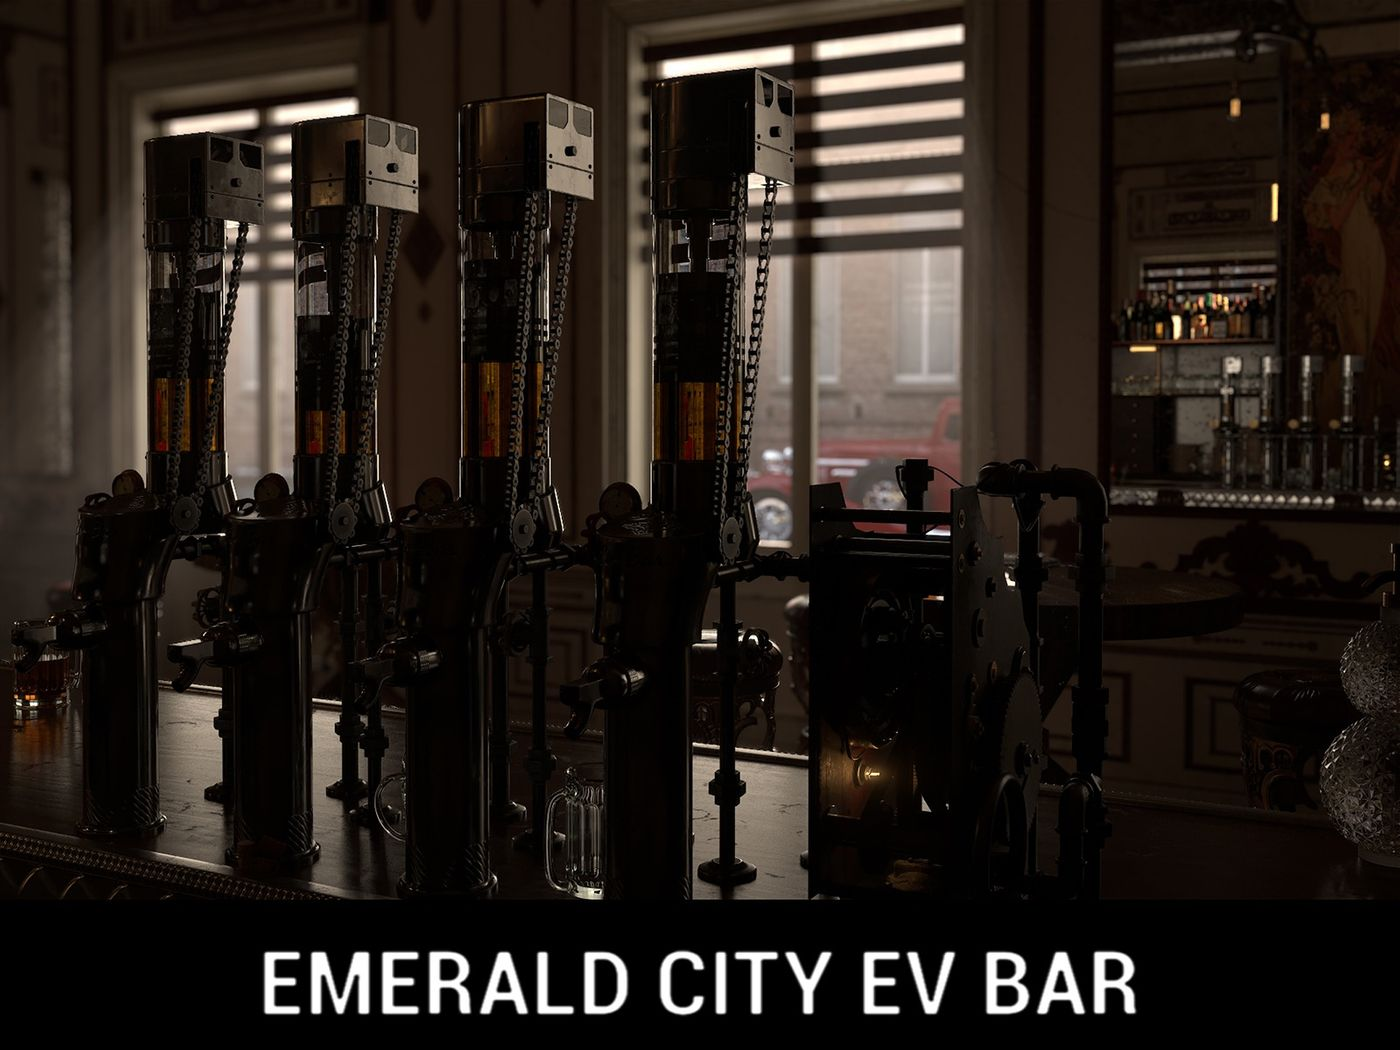 Emerald City Ev-Bar | CG Environment Reel